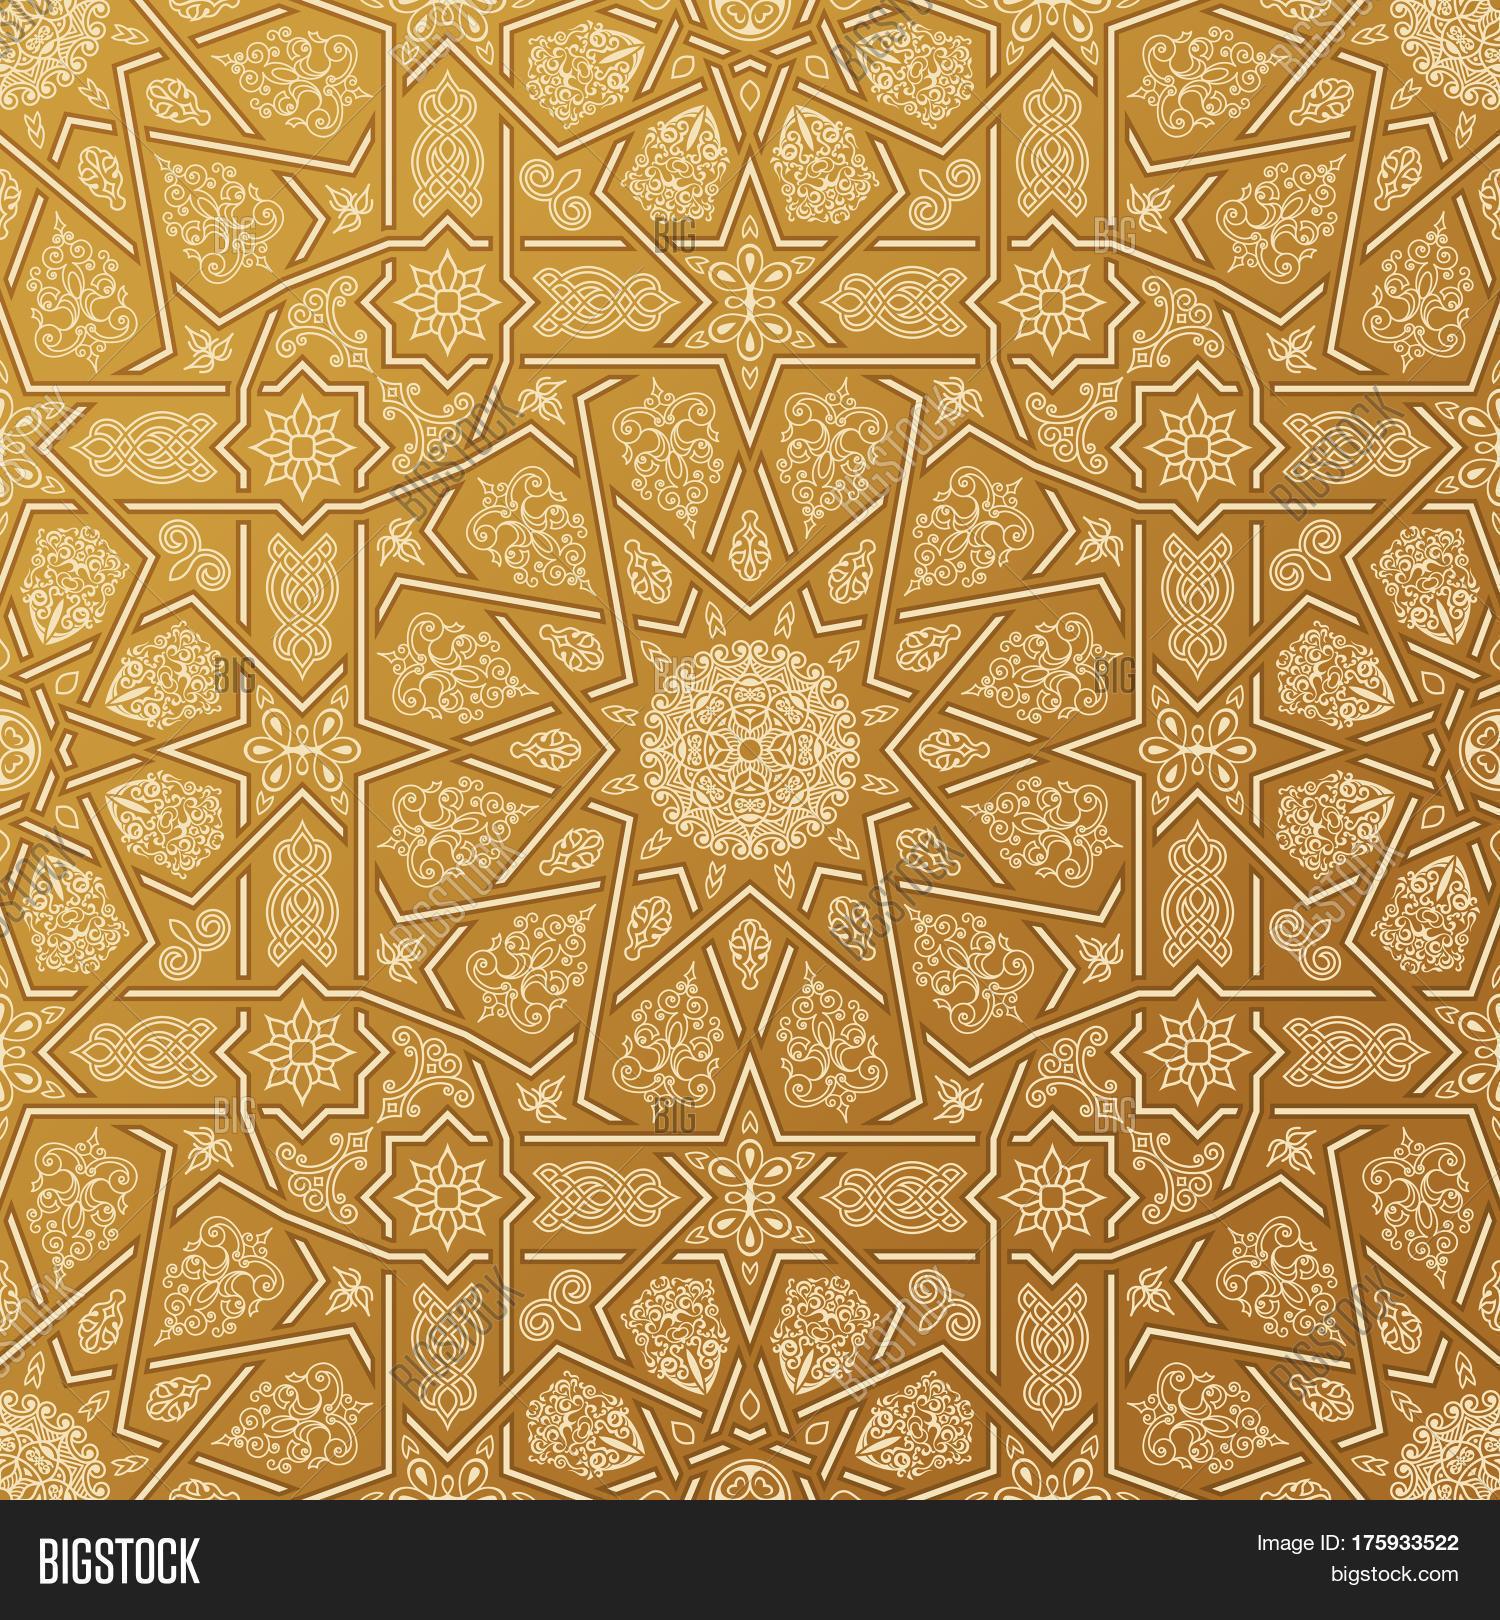 Moroccan geometric pattern royalty free stock photos image 13547078 - Morocco Pattern Stock Images Royalty Free Vectors 450x470 Moroccan Arabic Stencil Pattern Geometric Wall 340x270 Seamless